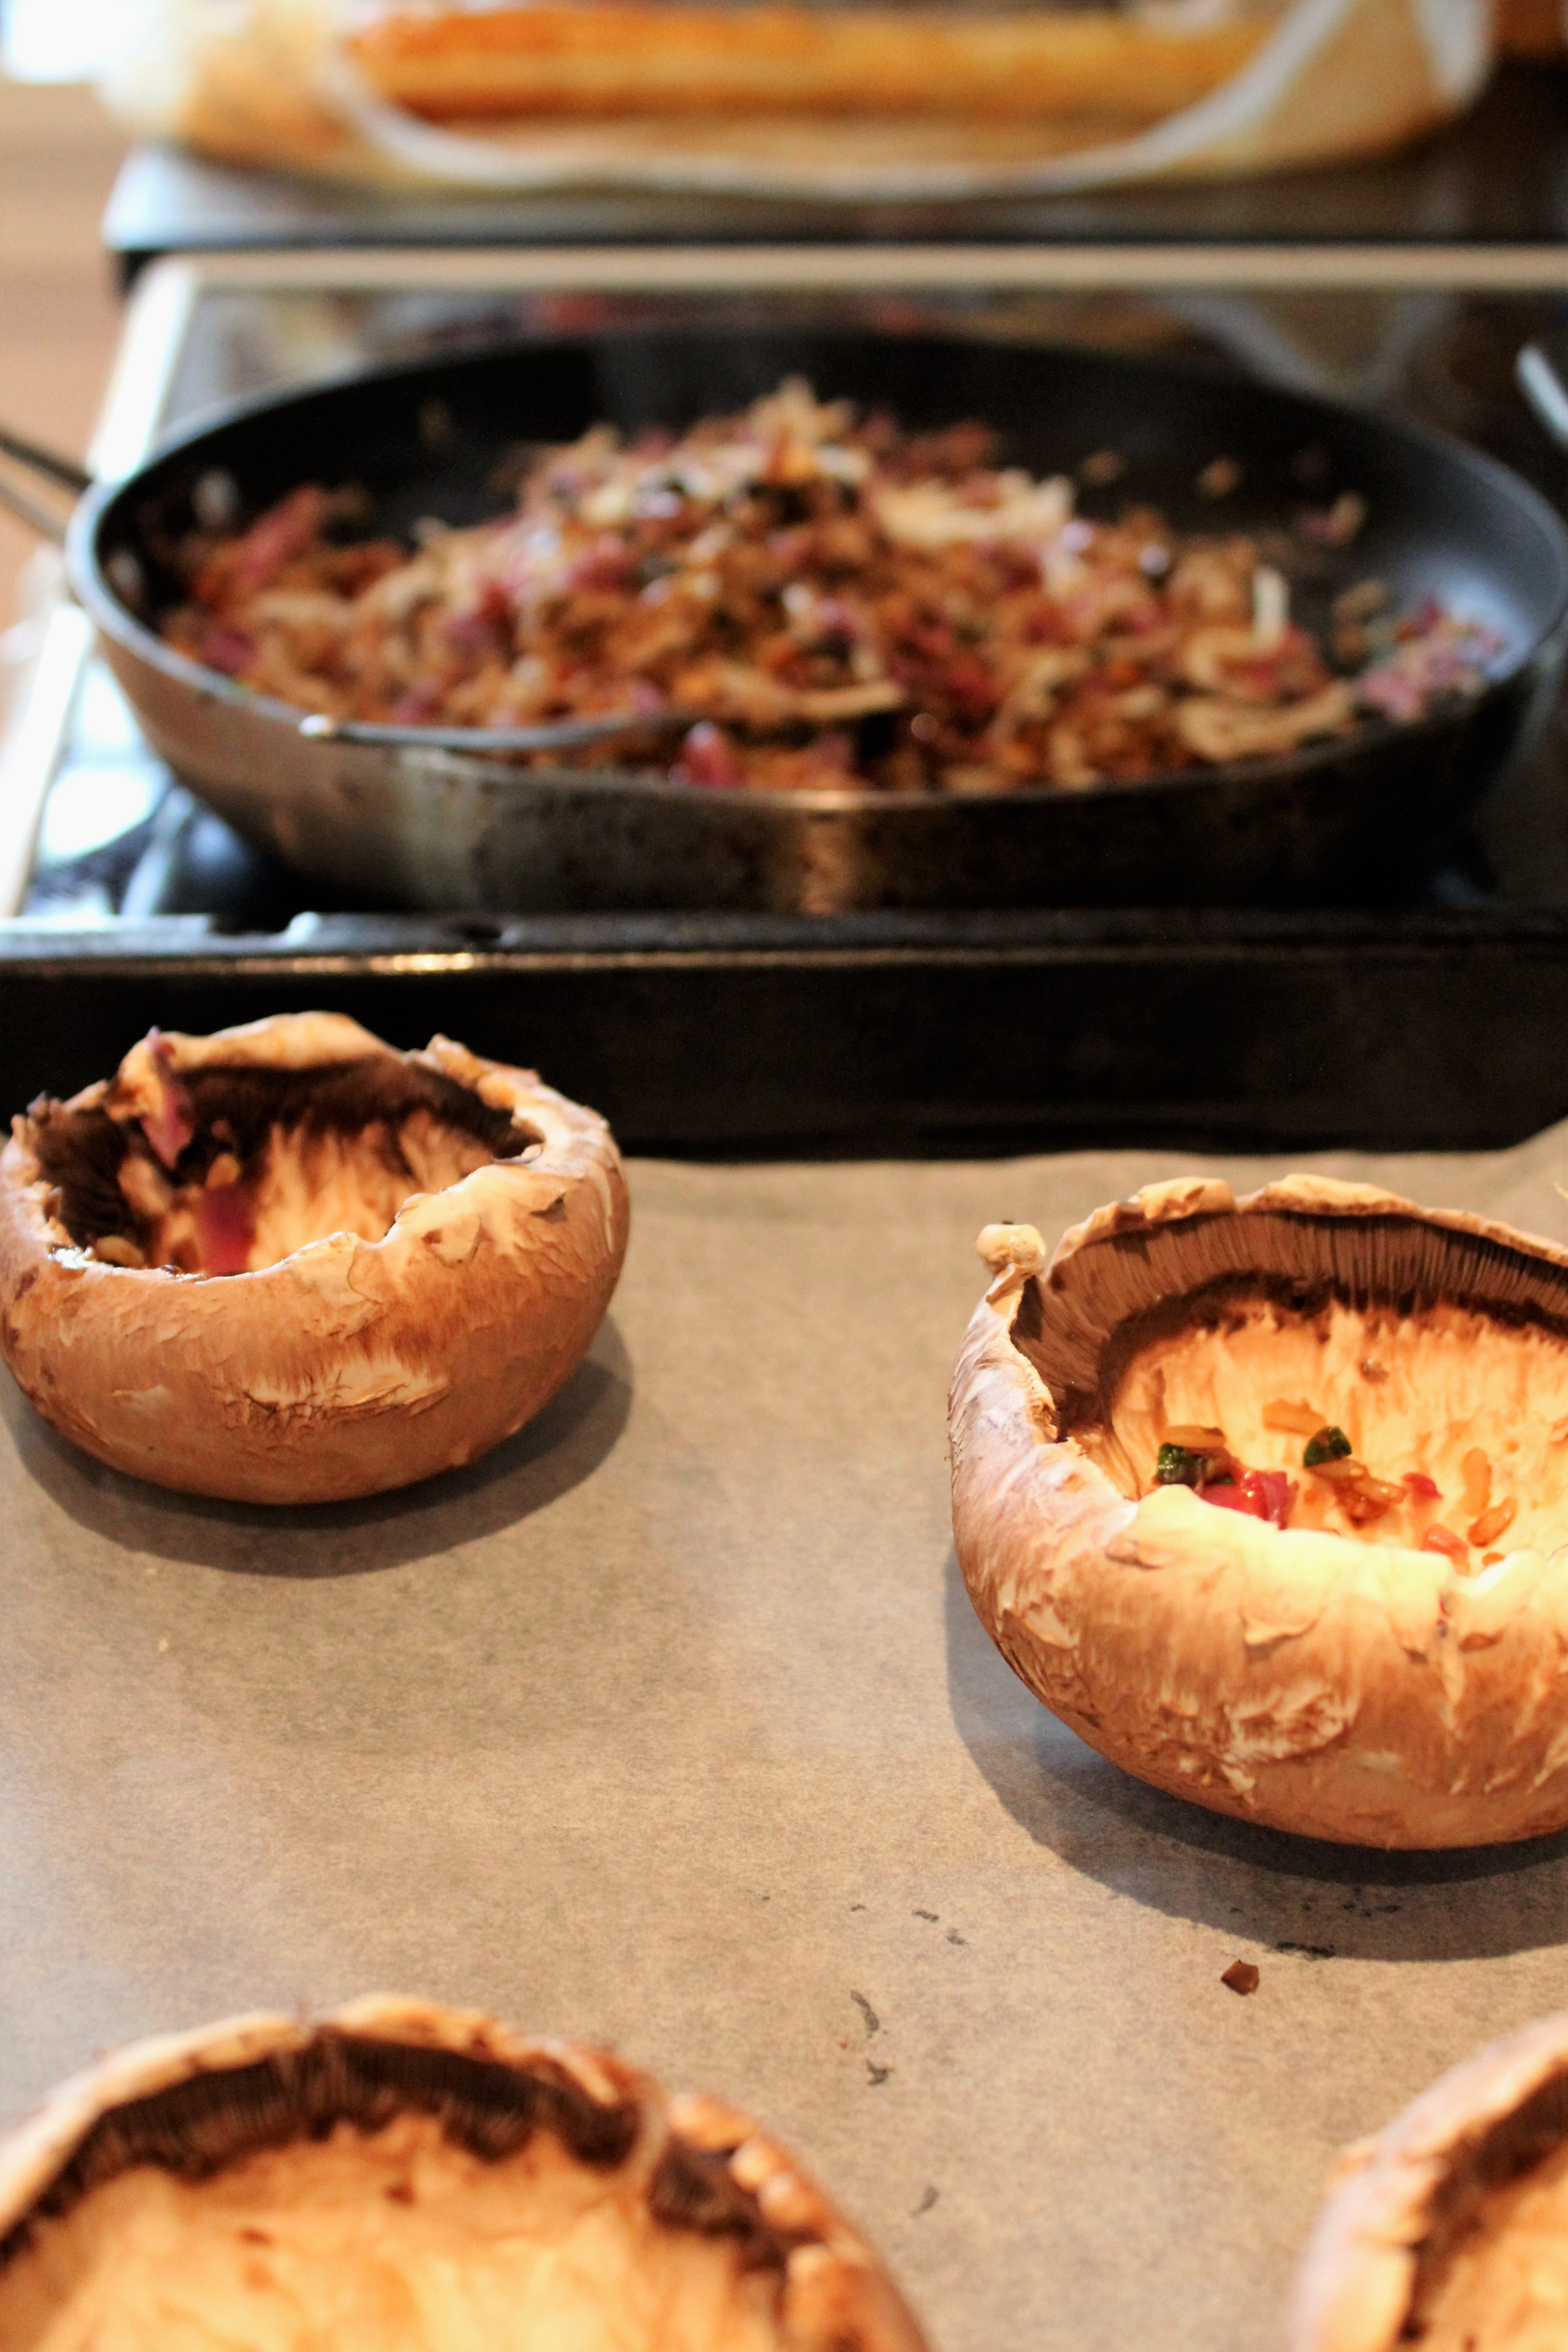 fyldte portobello svampe med gedeost